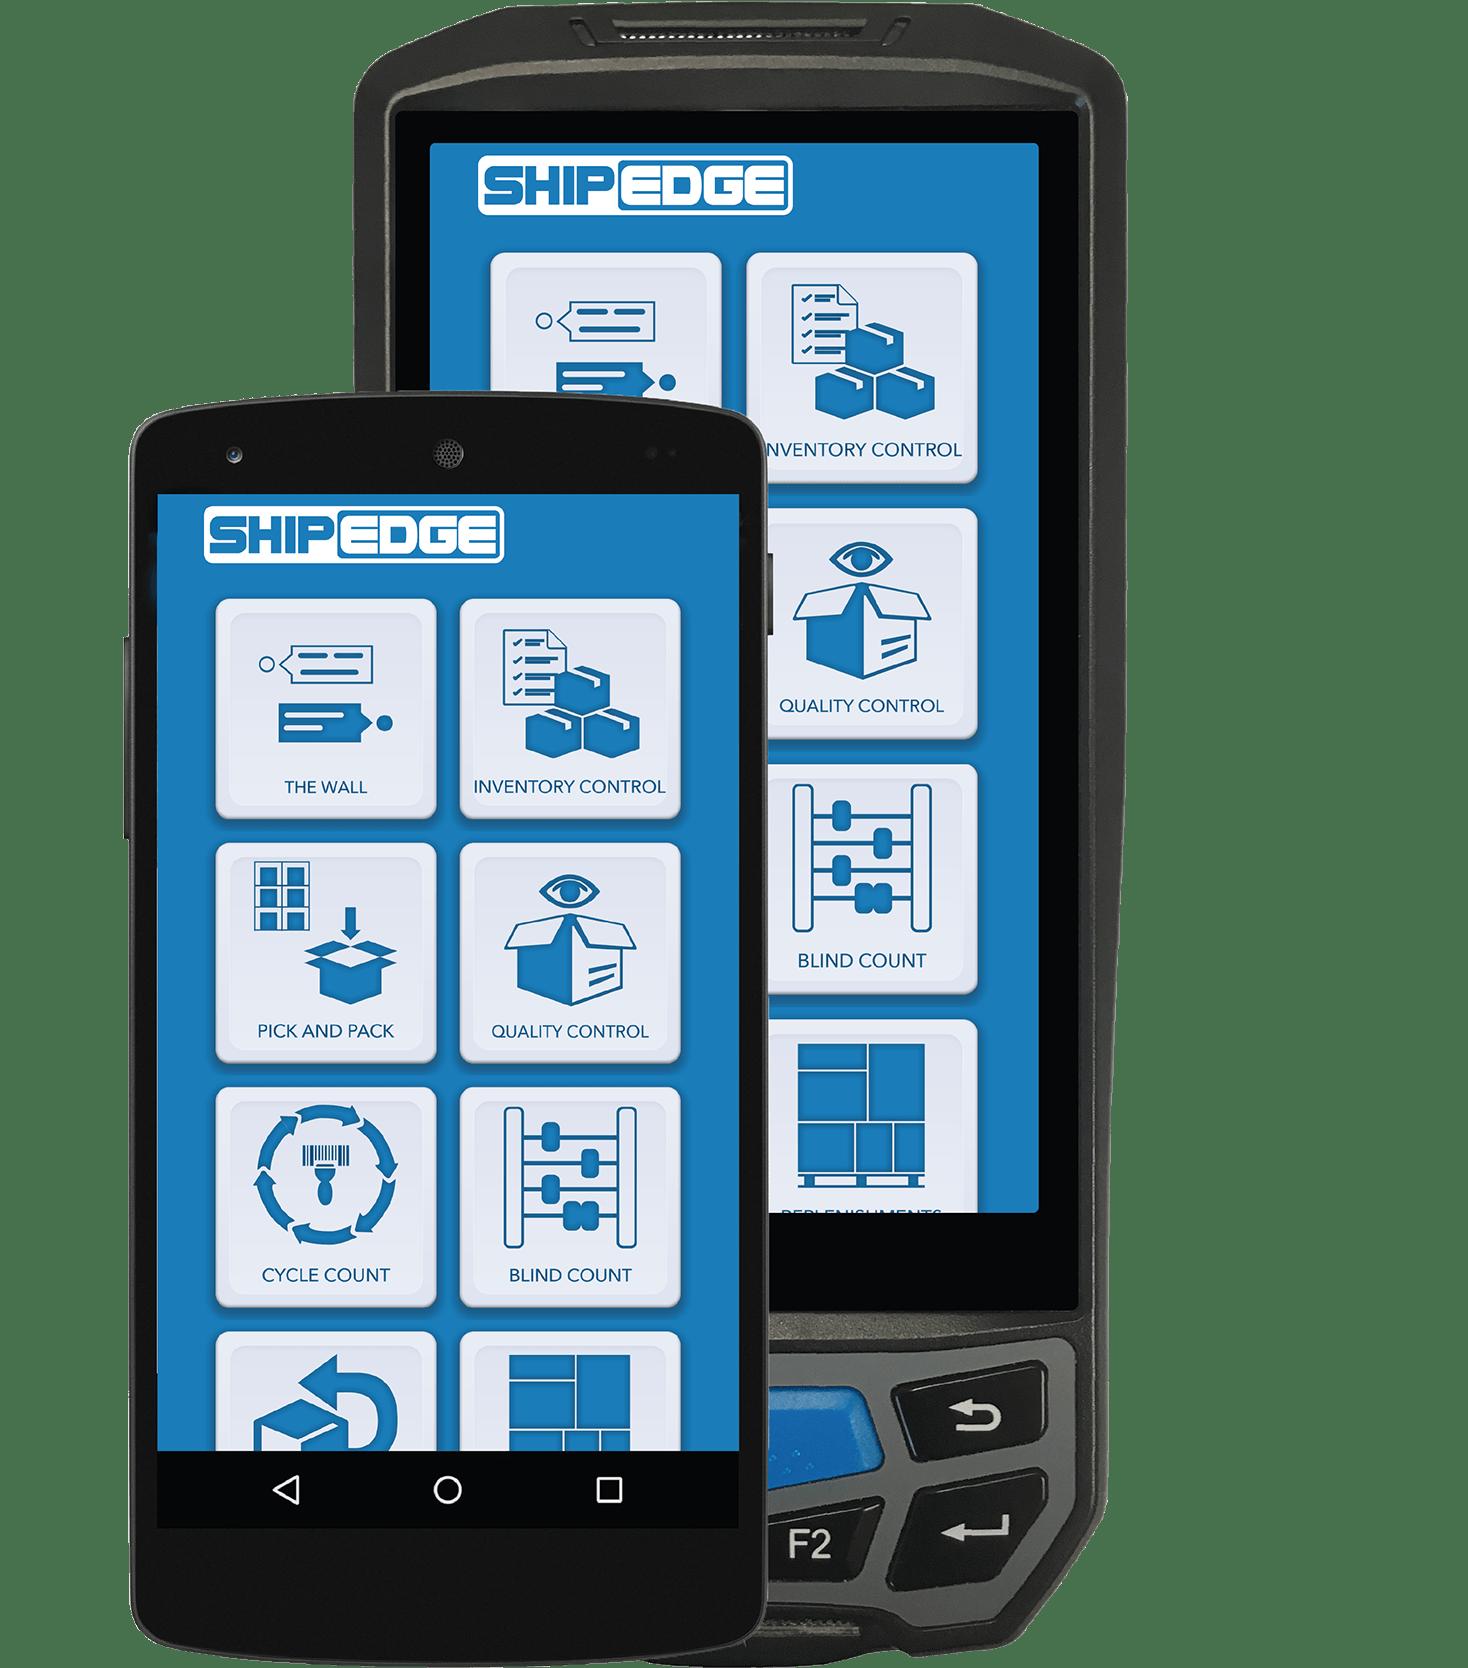 Shipedge Software - 2